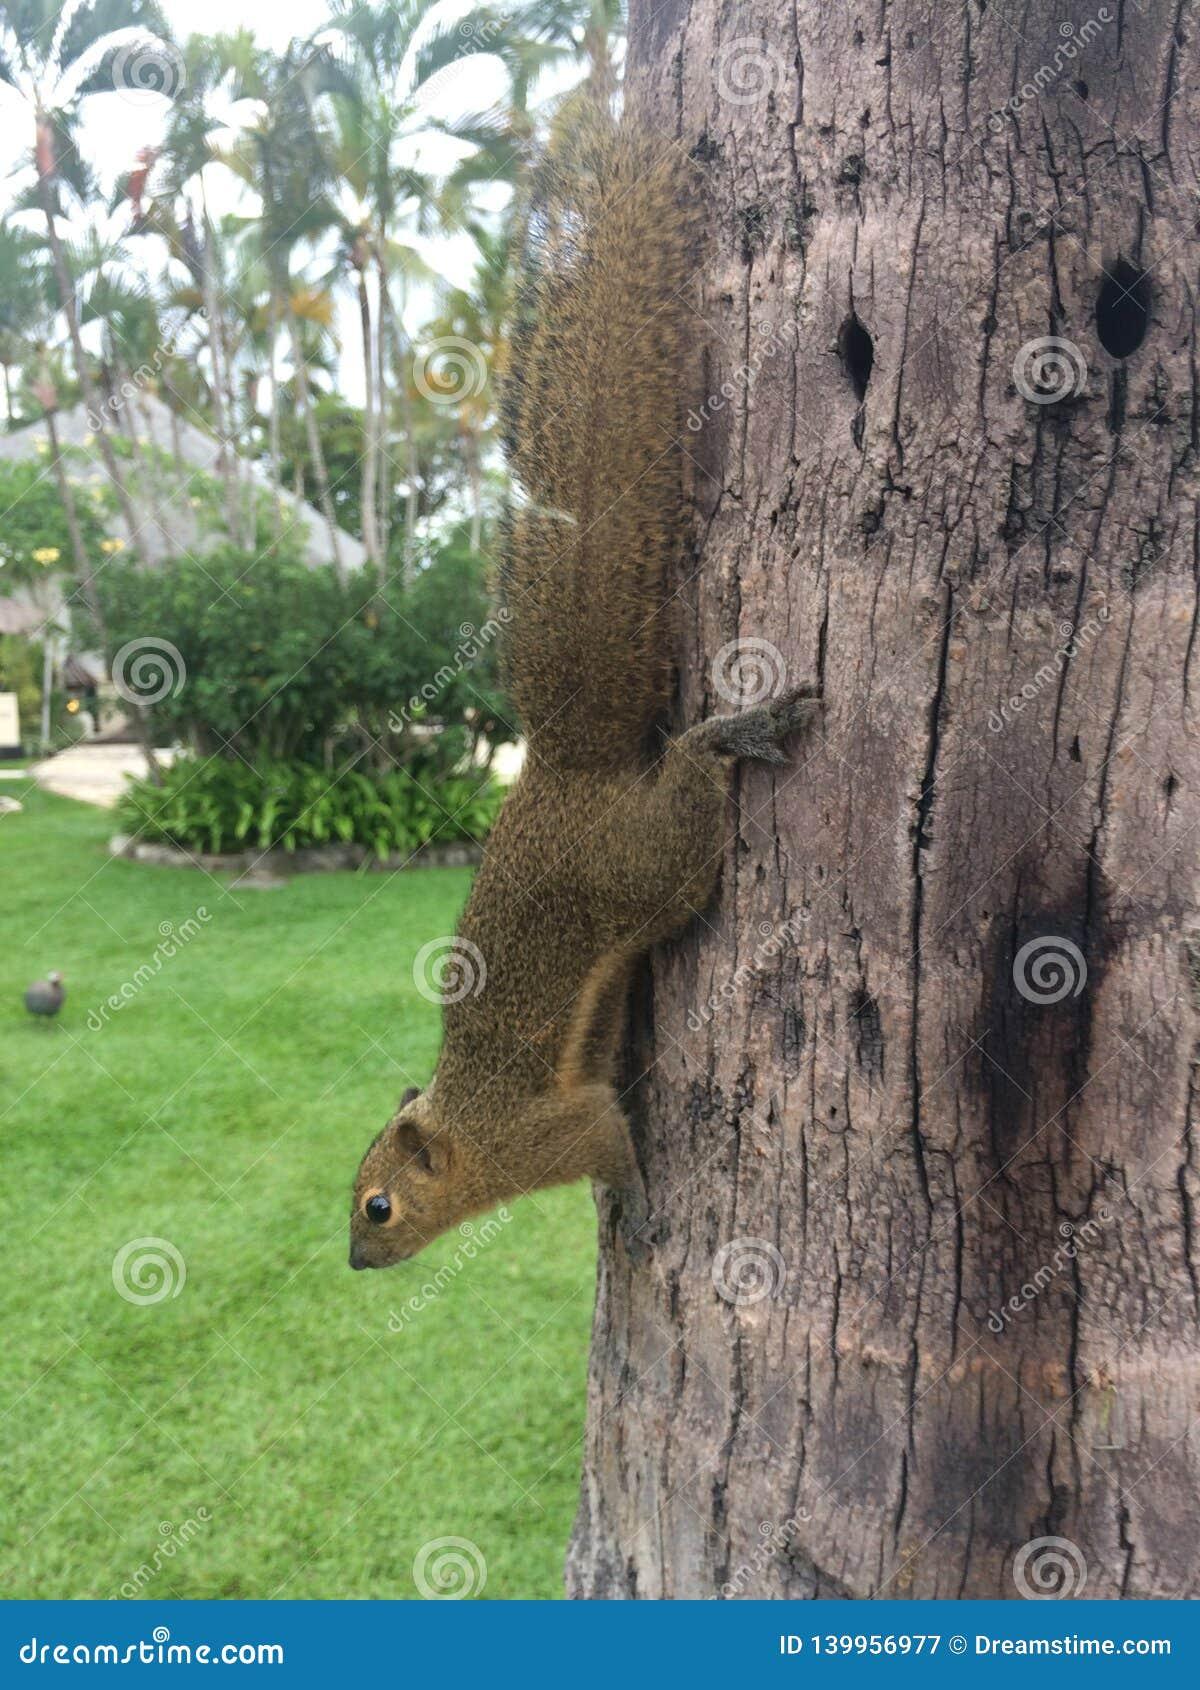 Chipmunk on the tree Bali Indonesia